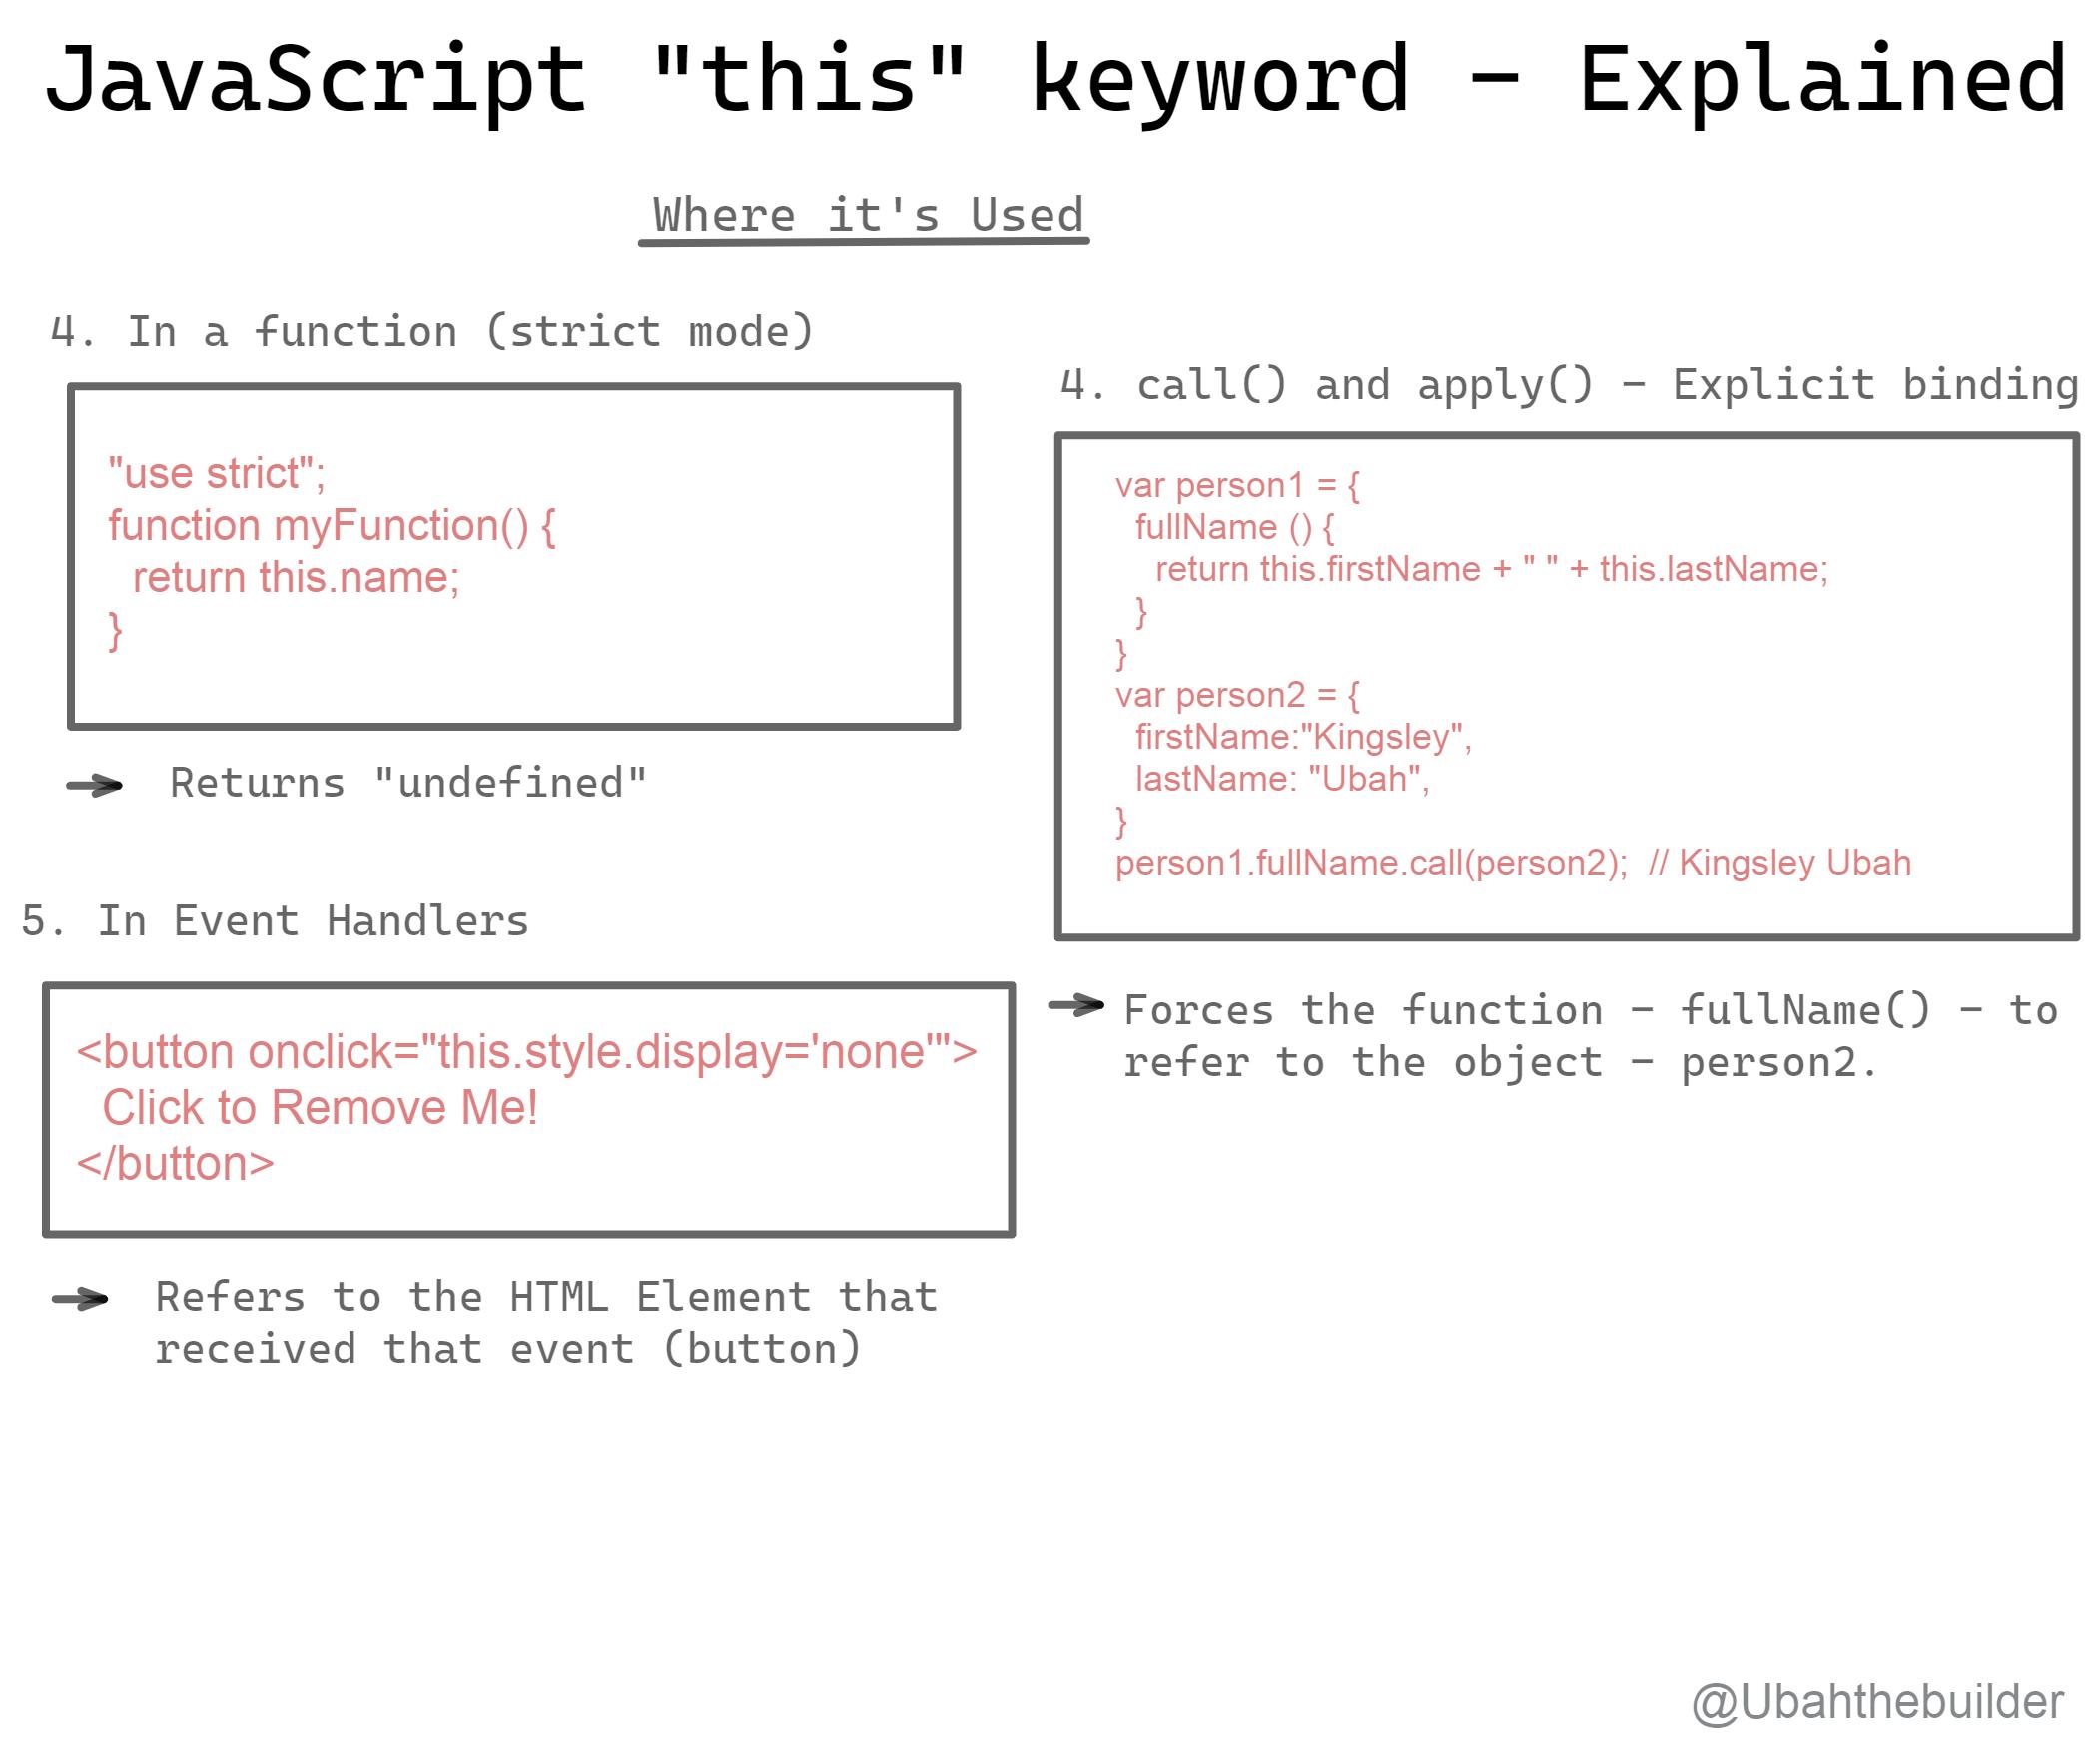 An Image Explaining the 'this' keyword